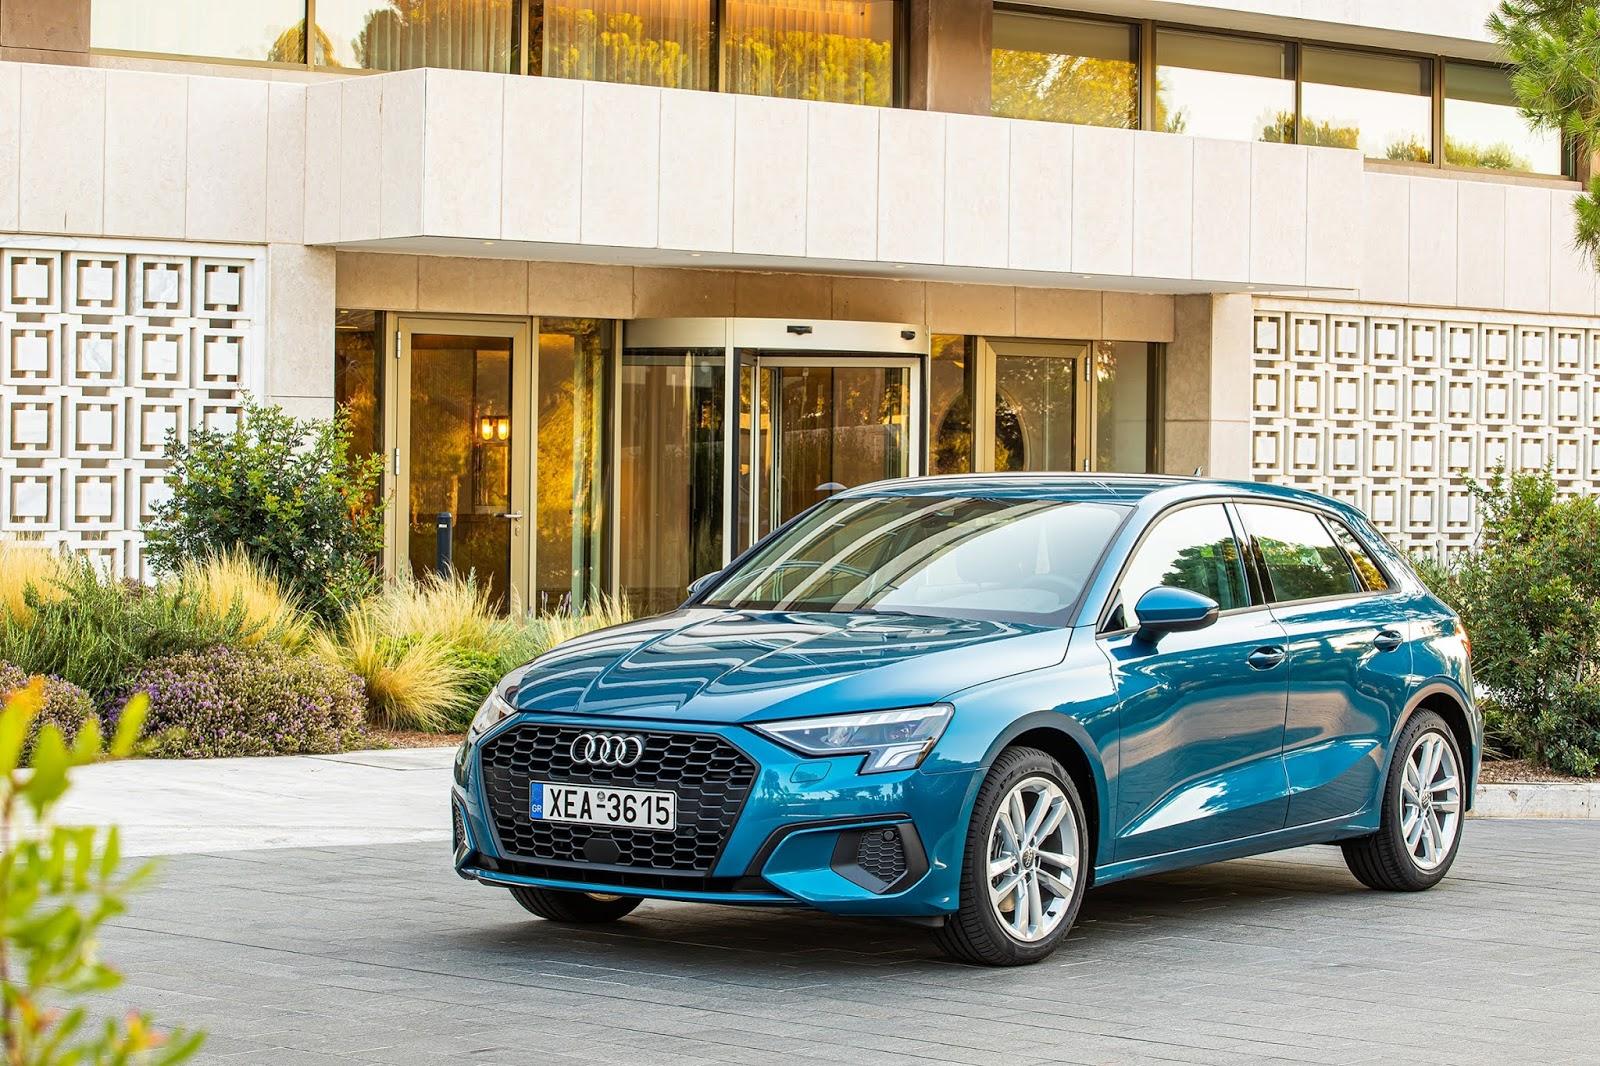 "NEW2BAUDI2BA32BSPORTBACK Πακέτα service ""Smart Packs"" και ψηφιακές After Sales υπηρεσίες από την Audi After Sales, Audi, covid, service, ειδήσεις"